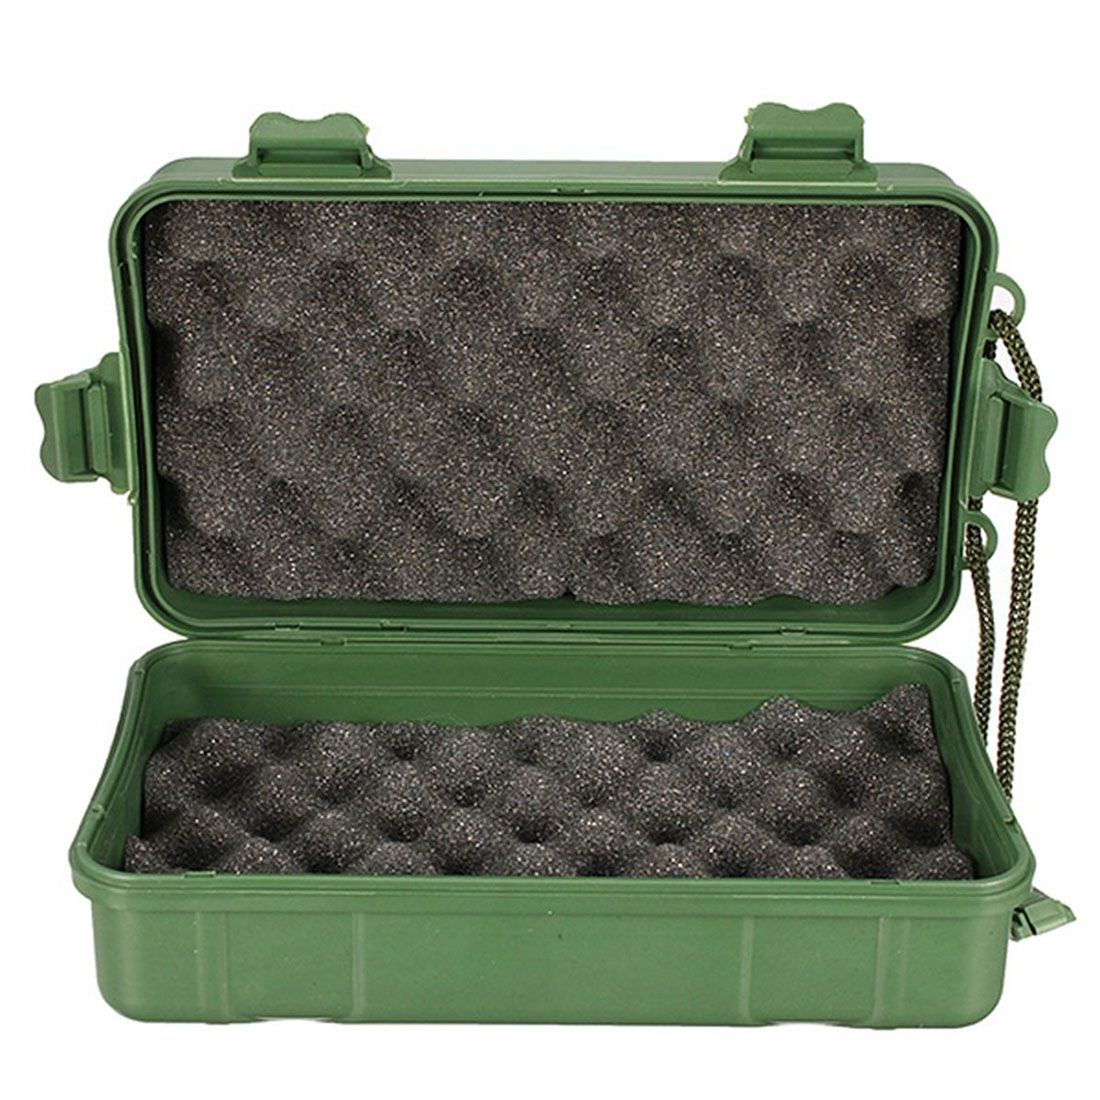 Storage-Box Case-Holder Torch Flashlight-Light Battery-Charger Plastic Black Waterproof